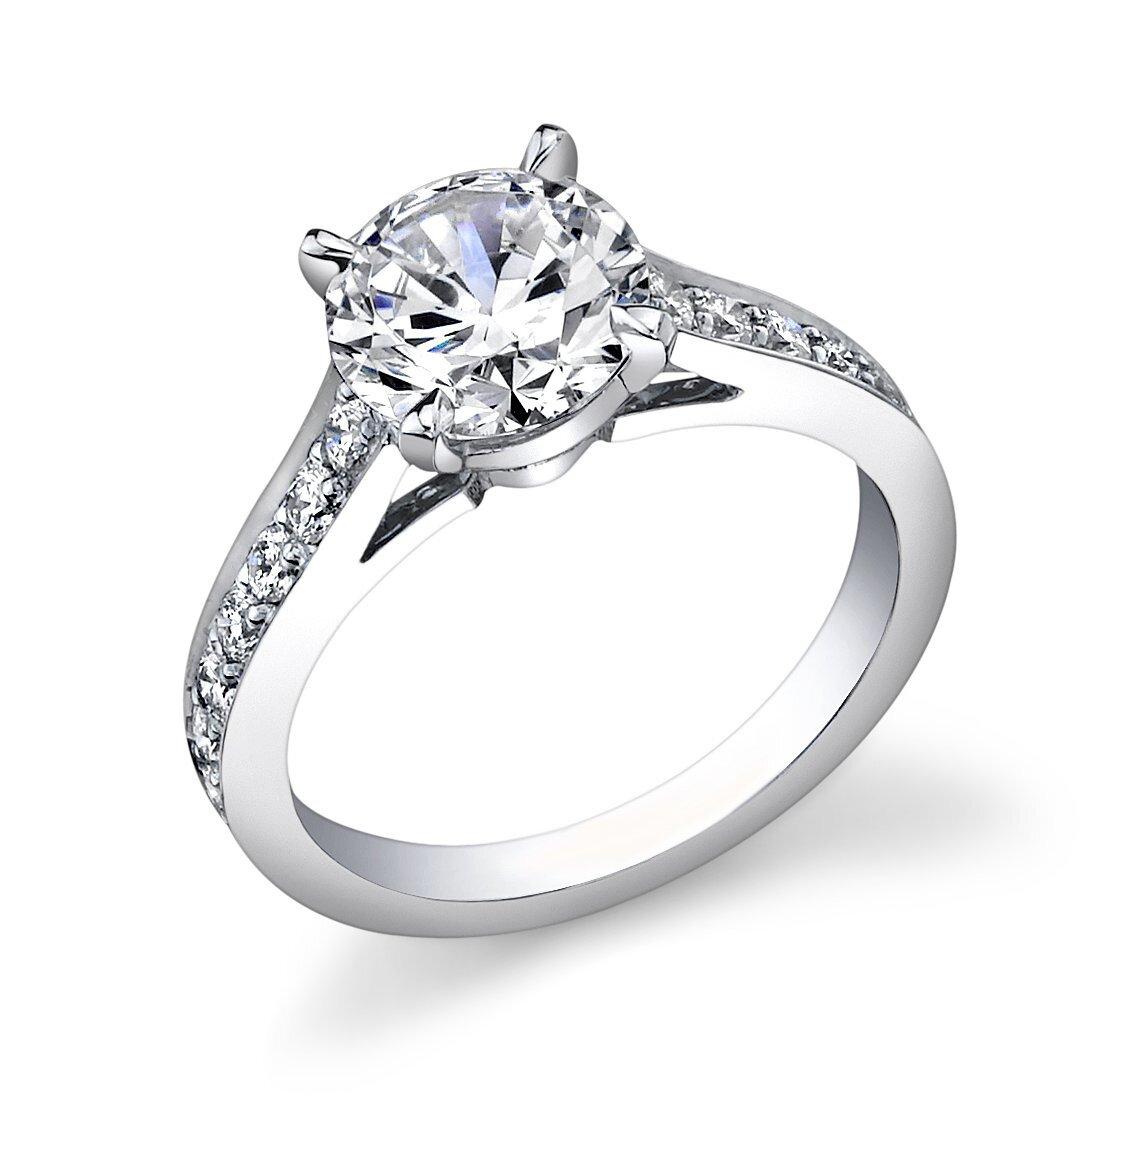 diamond rings diamond jewelry jewelry designs pearl jewelry